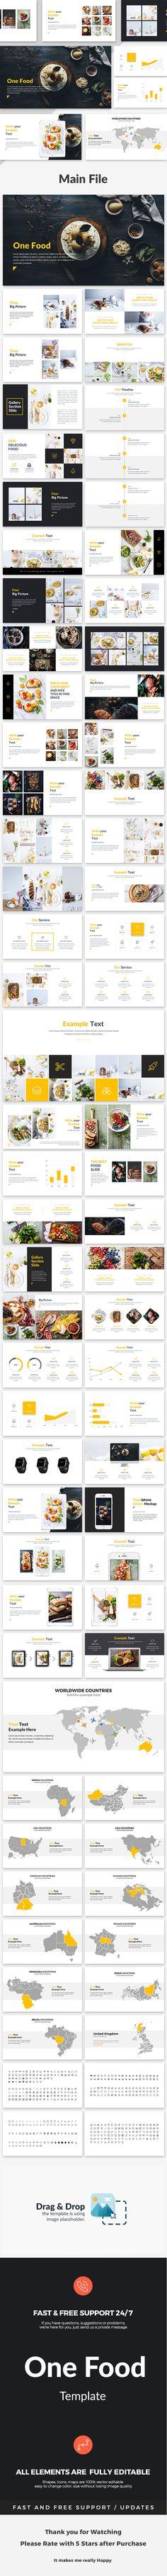 One Food  Creative Google Slide Template — Google Slides PPTX #industrial #info graphics • Download ➝ https://graphicriver.net/item/one-food-creative-google-slide-template/18928069?ref=pxcr